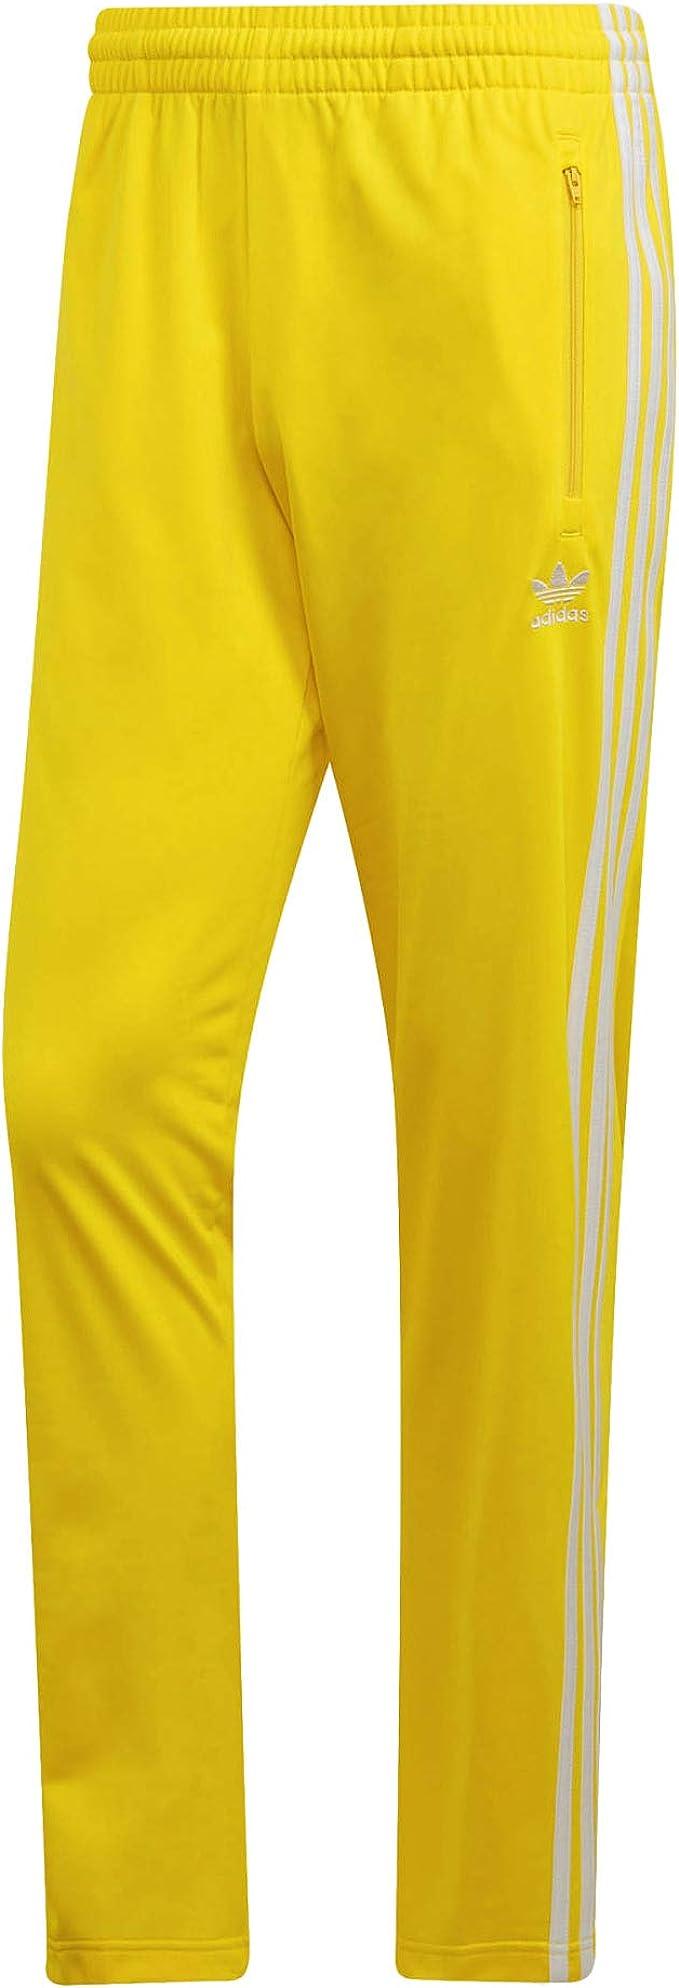 adidas Originals Firebird Track Pants Yellow LG: Amazon.es: Ropa ...